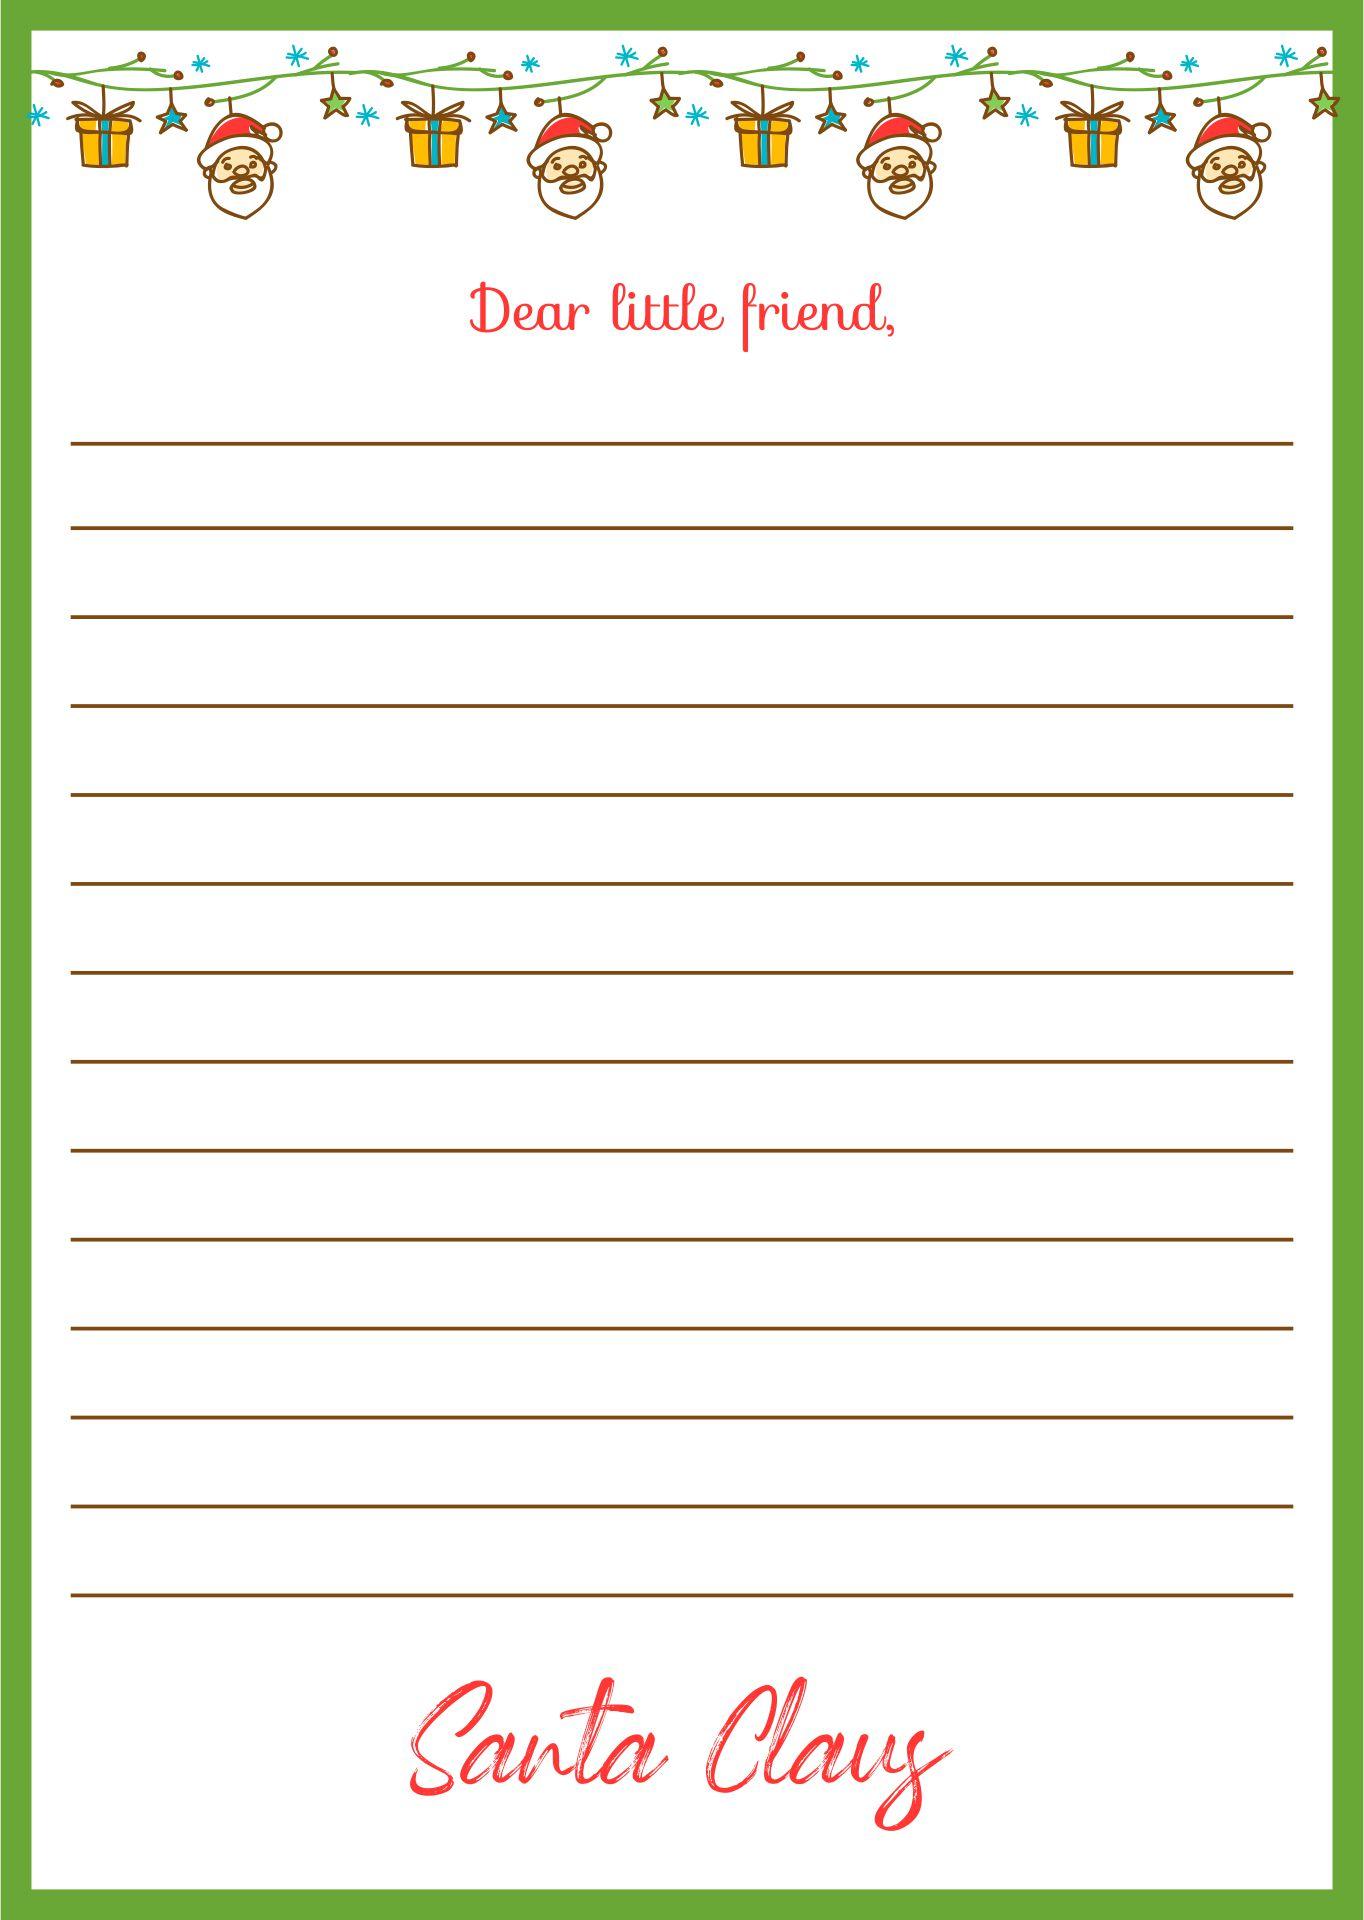 Printable Santa Claus Letter Template